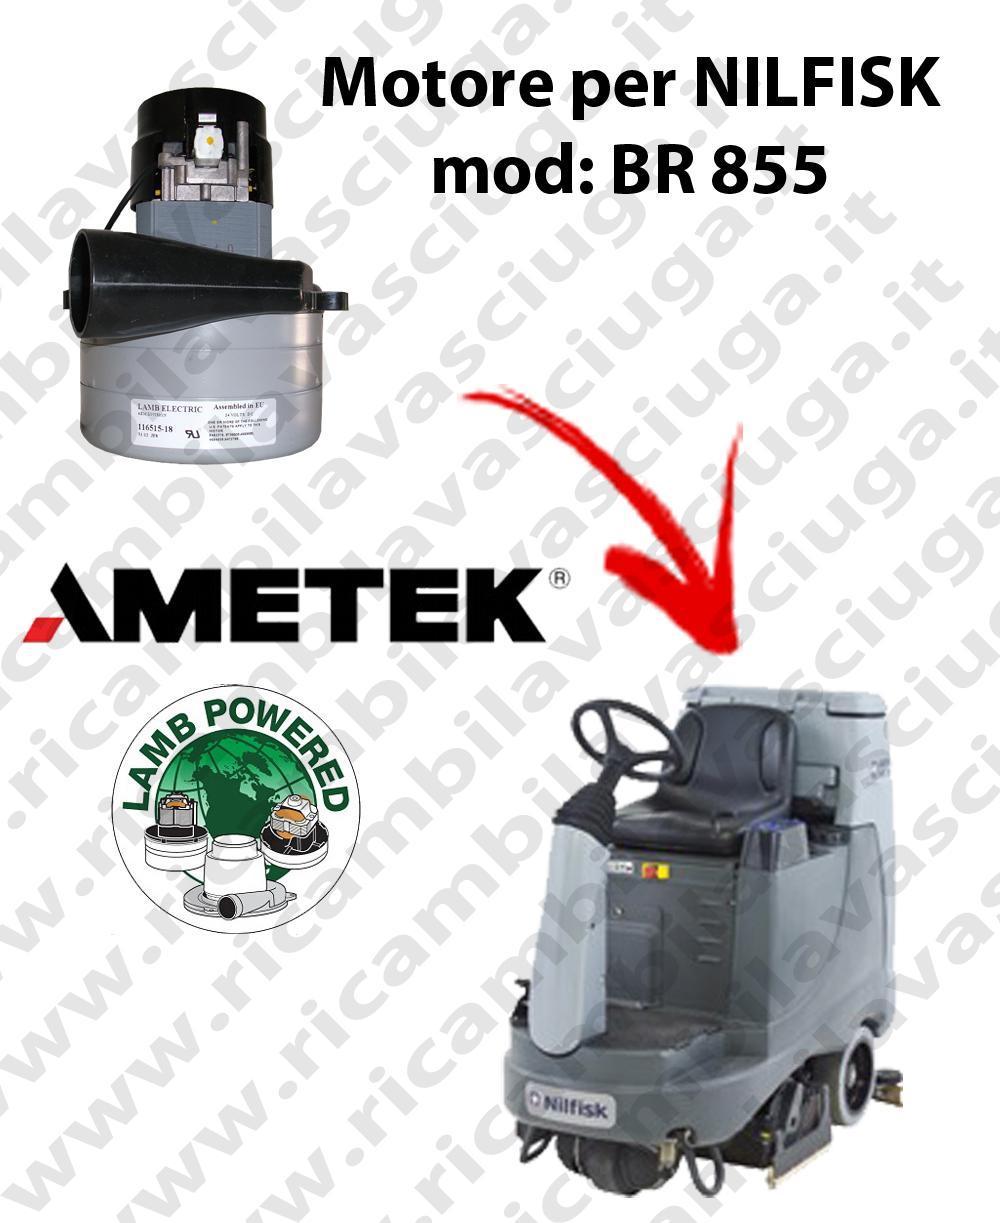 BR 855 Saugmotor LAMB AMETEK für scheuersaugmaschinen NILFISK